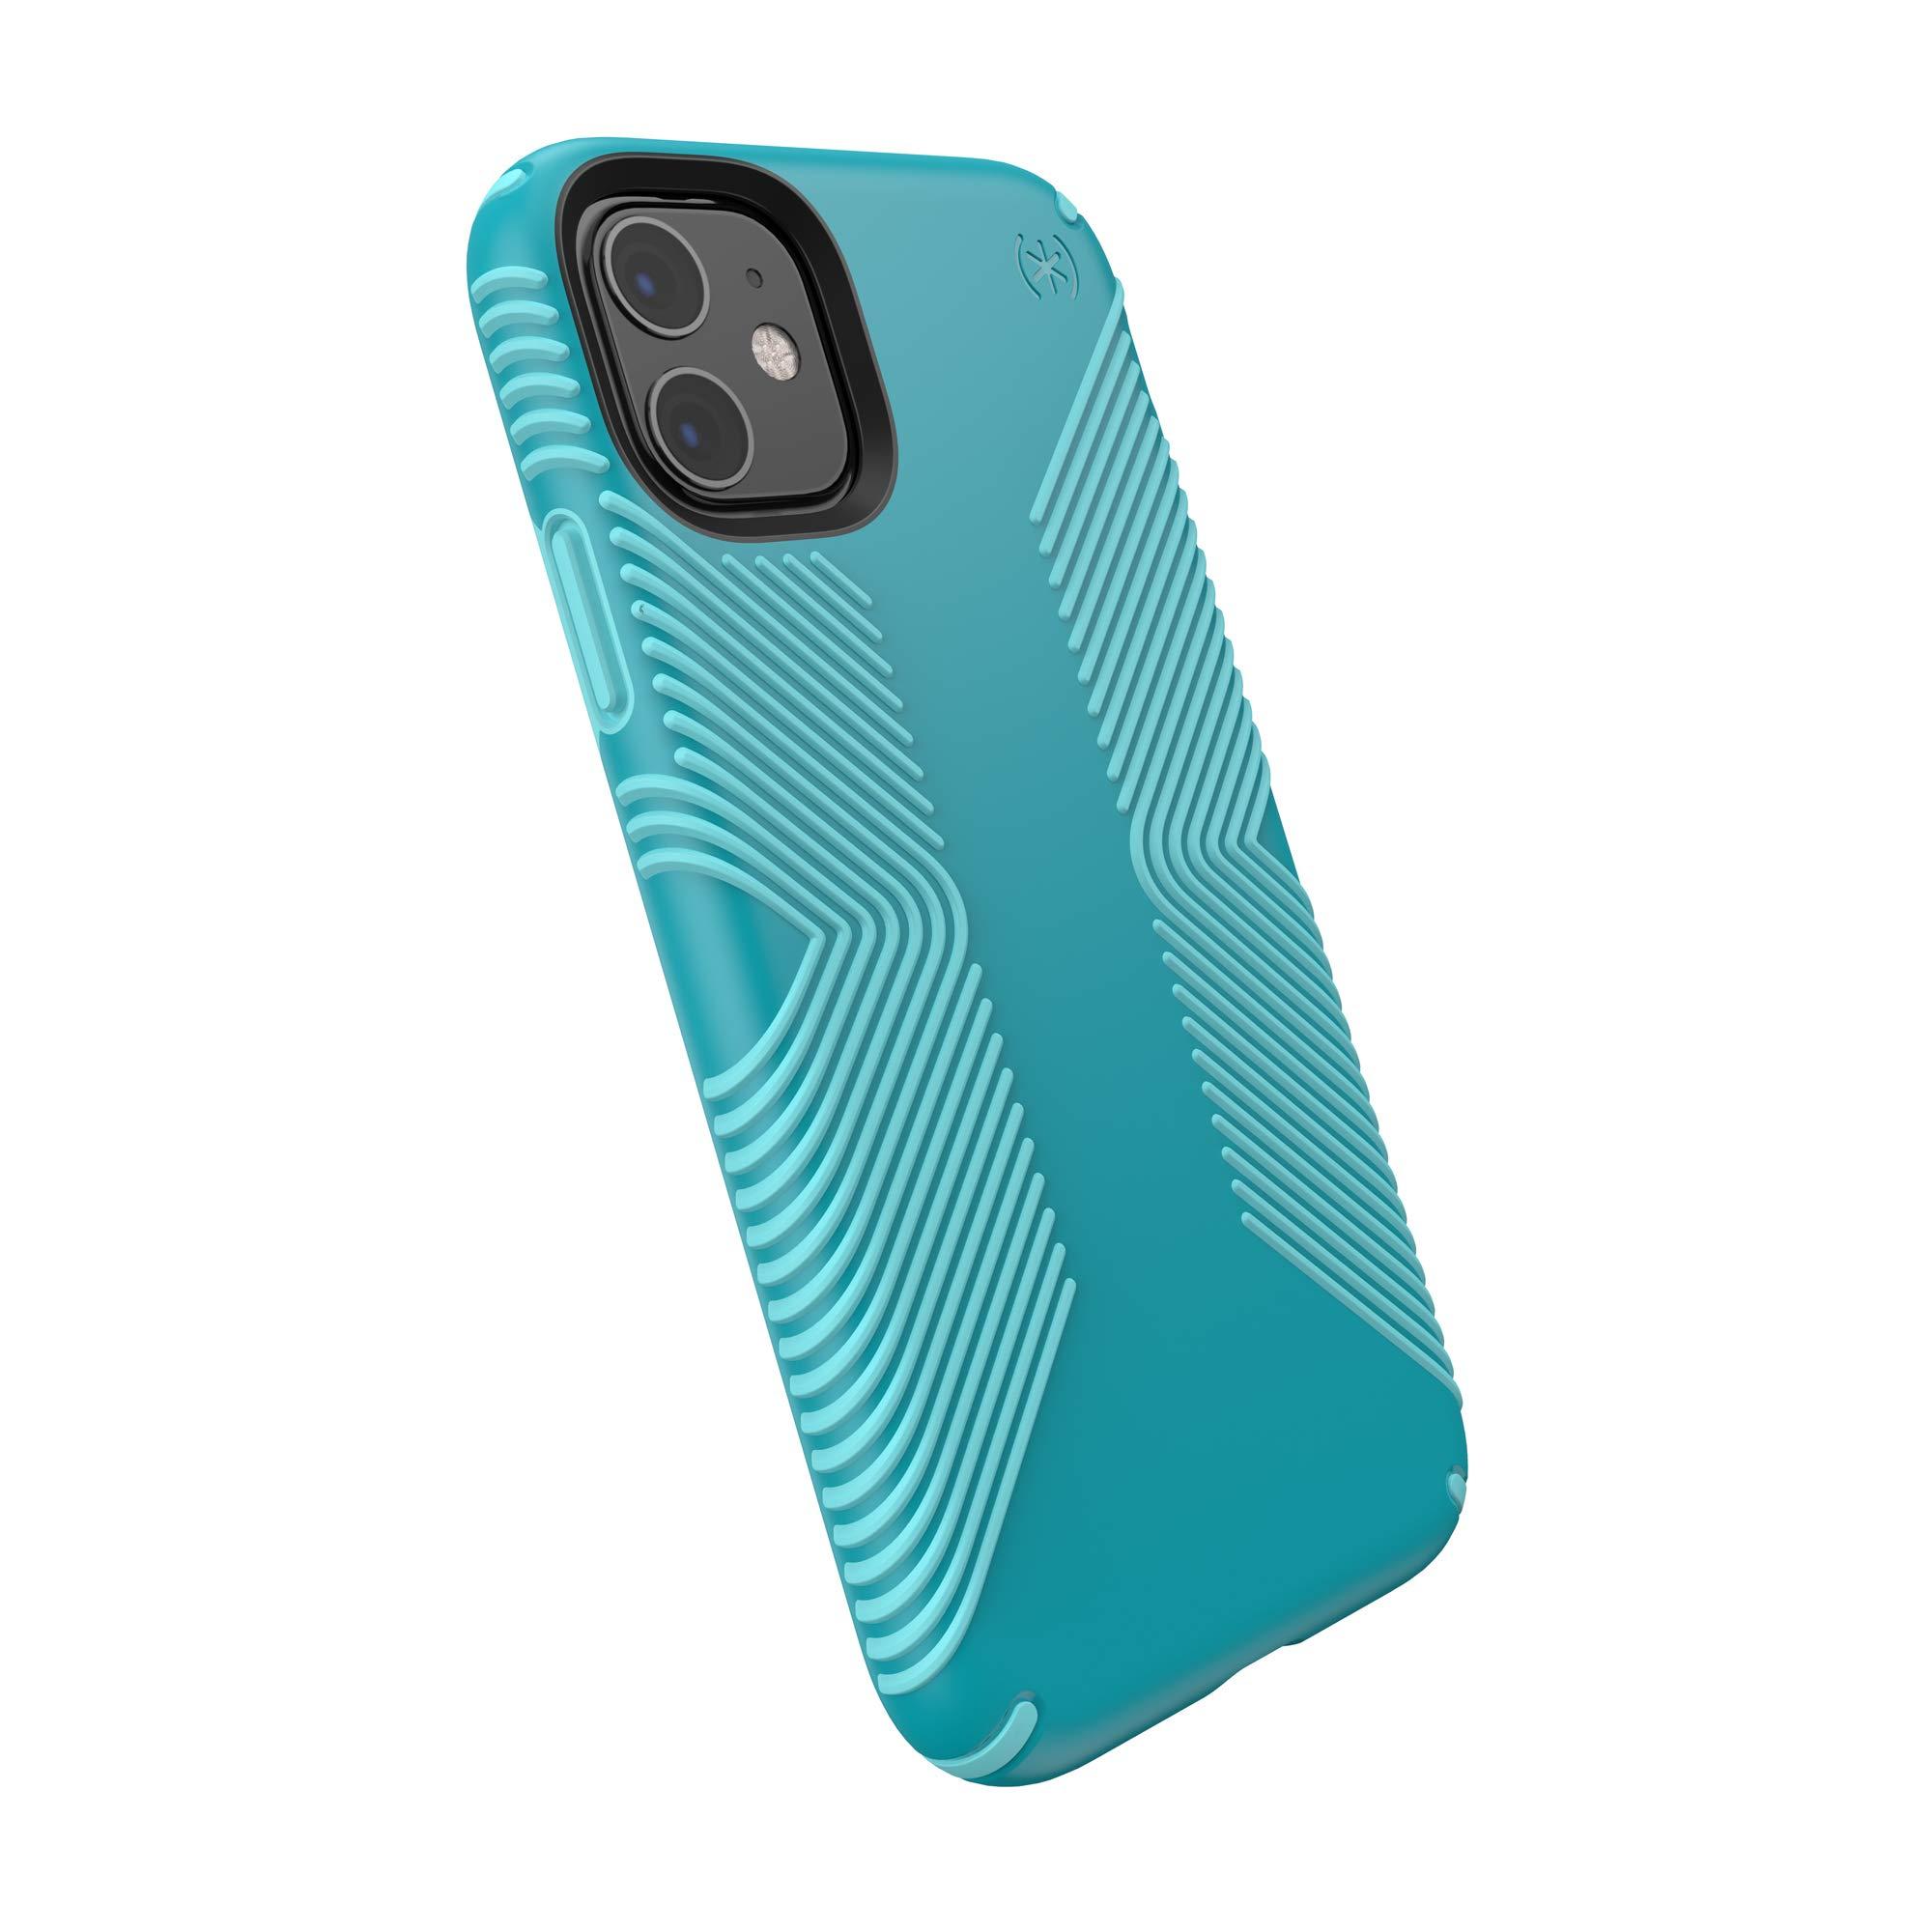 Speck Products Presidio Grip iPhone 11 Case, Bali Blue/Skyline Blue